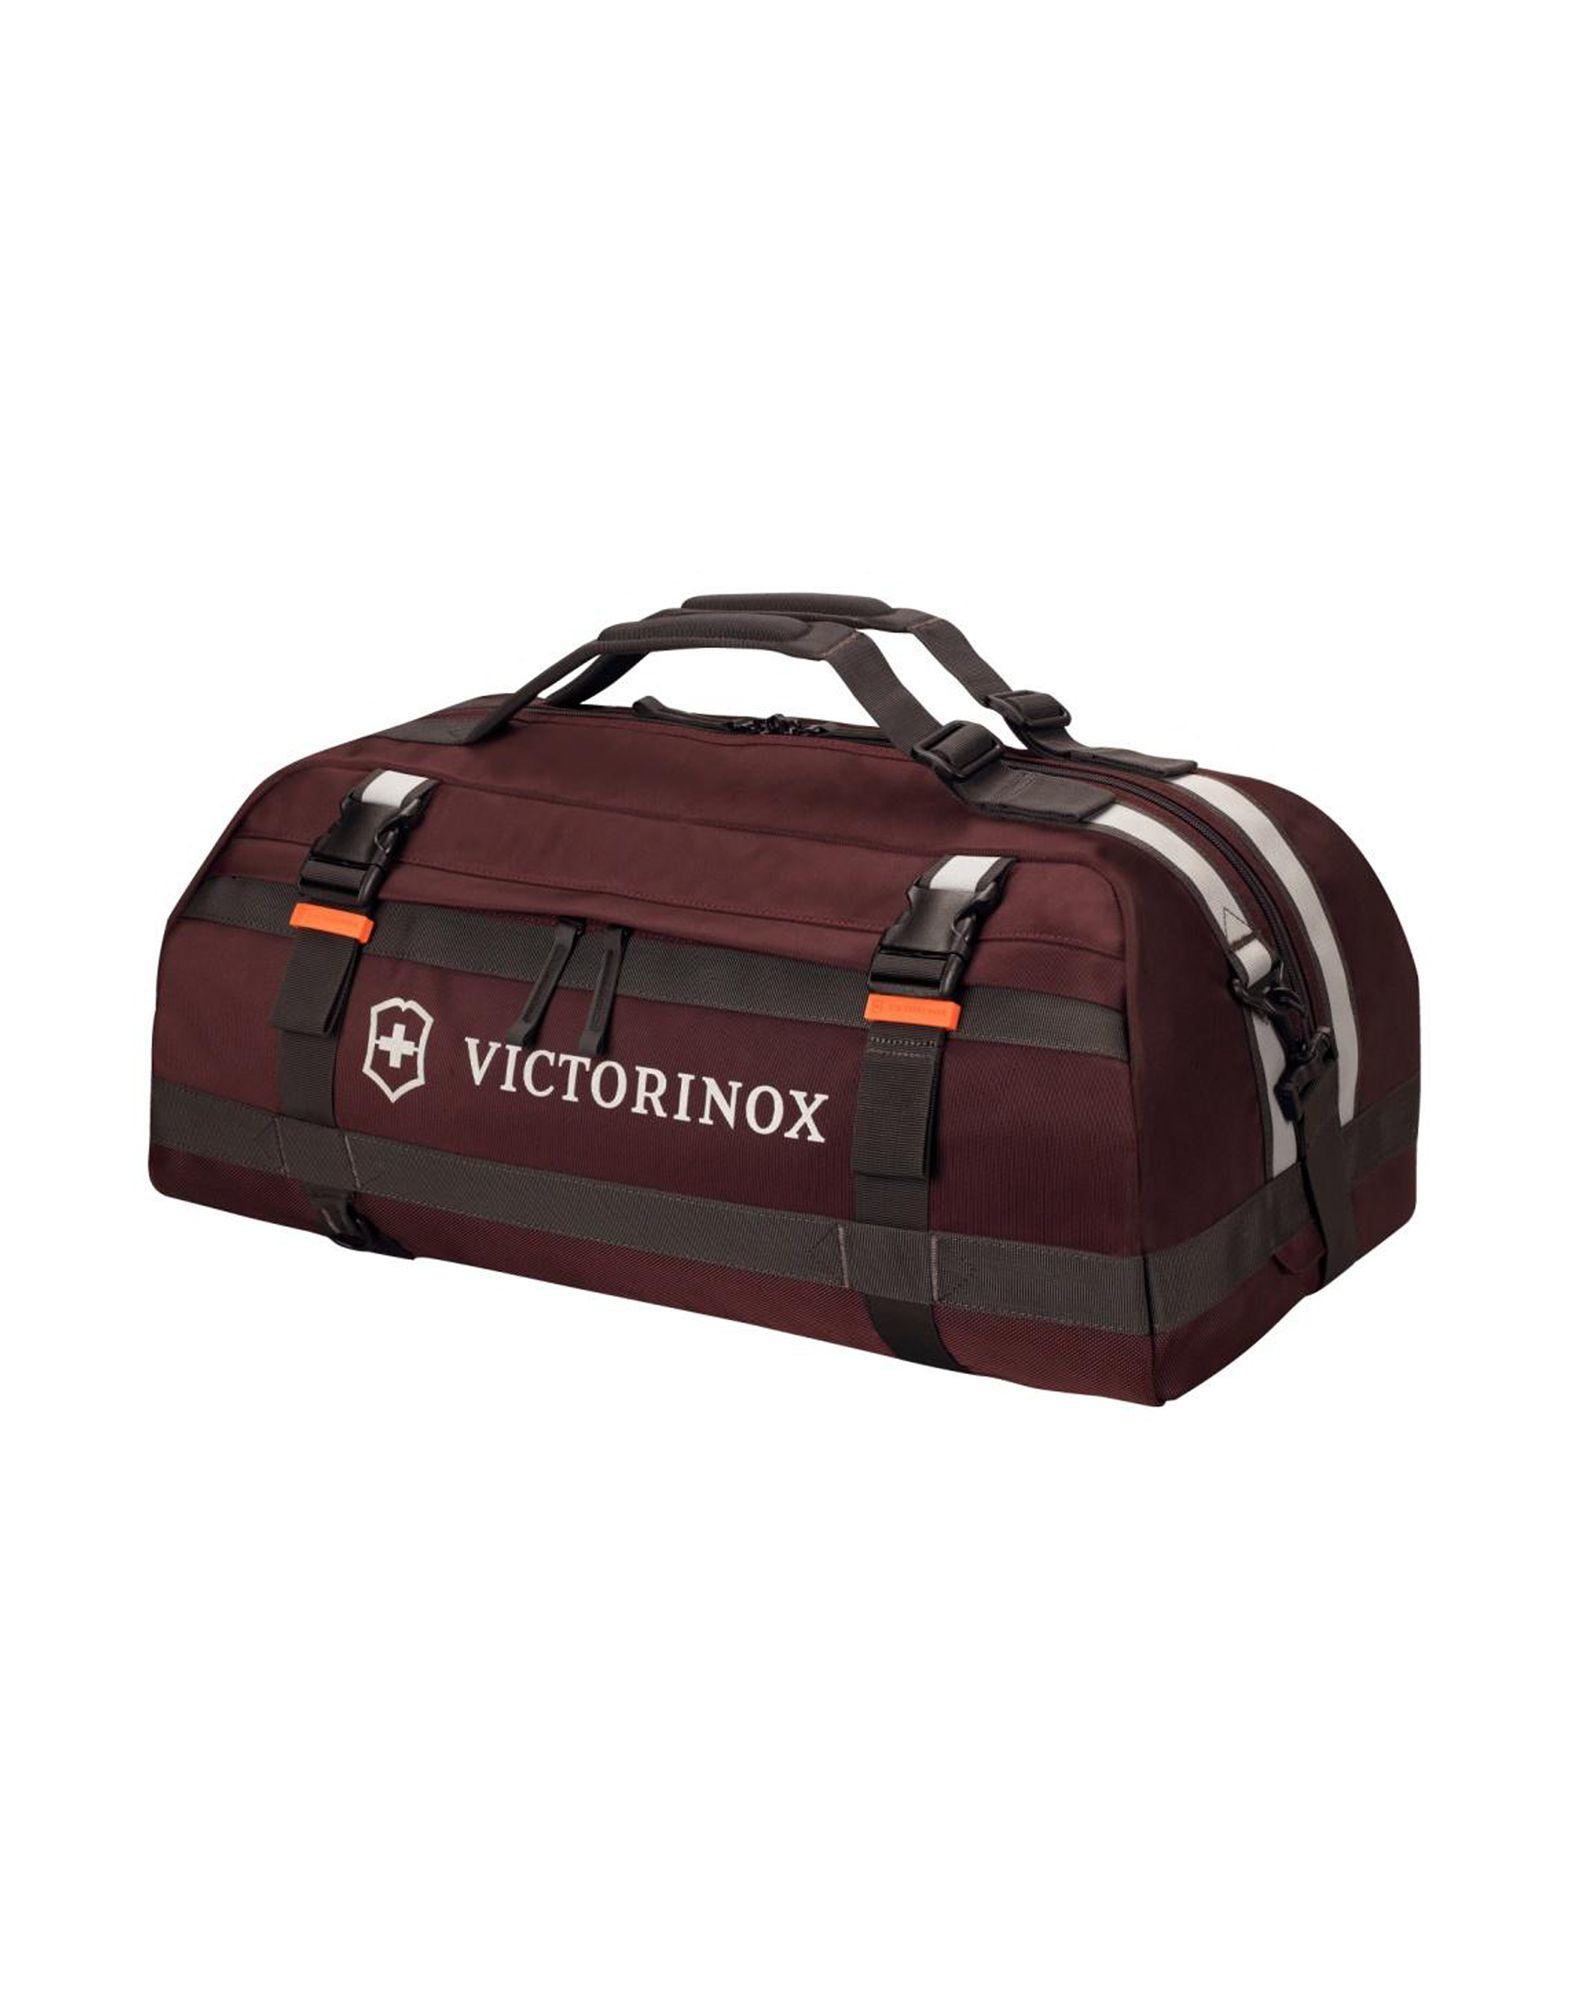 Victorinox Luggage in Purple for Men